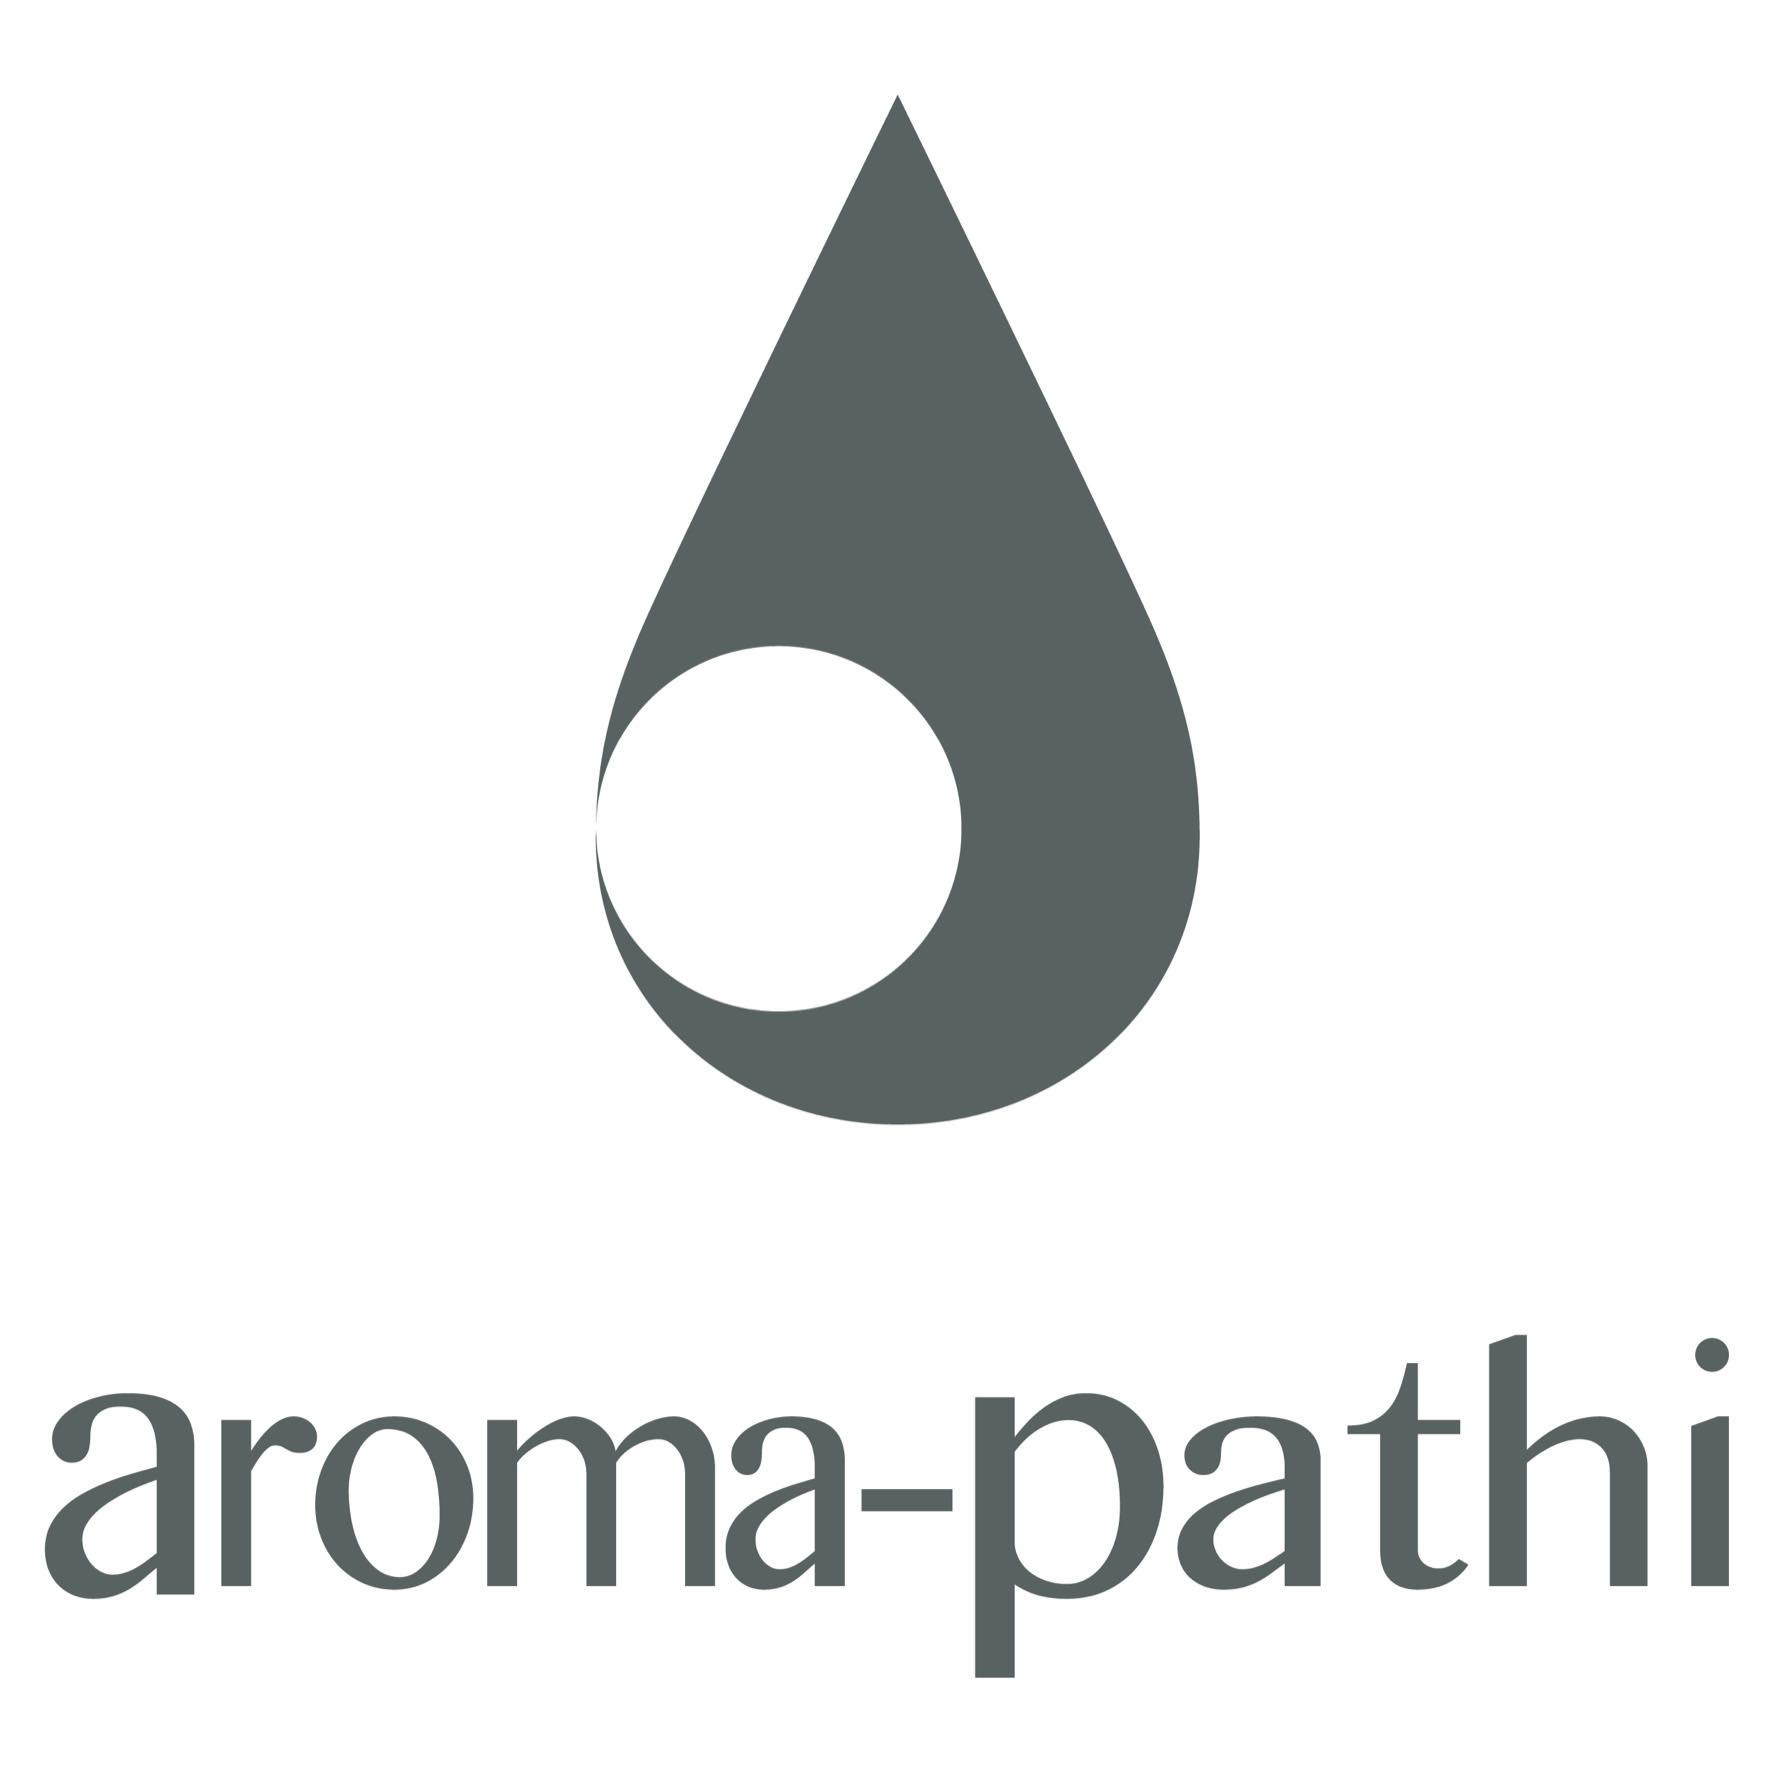 aroma-pathiオンラインサイト